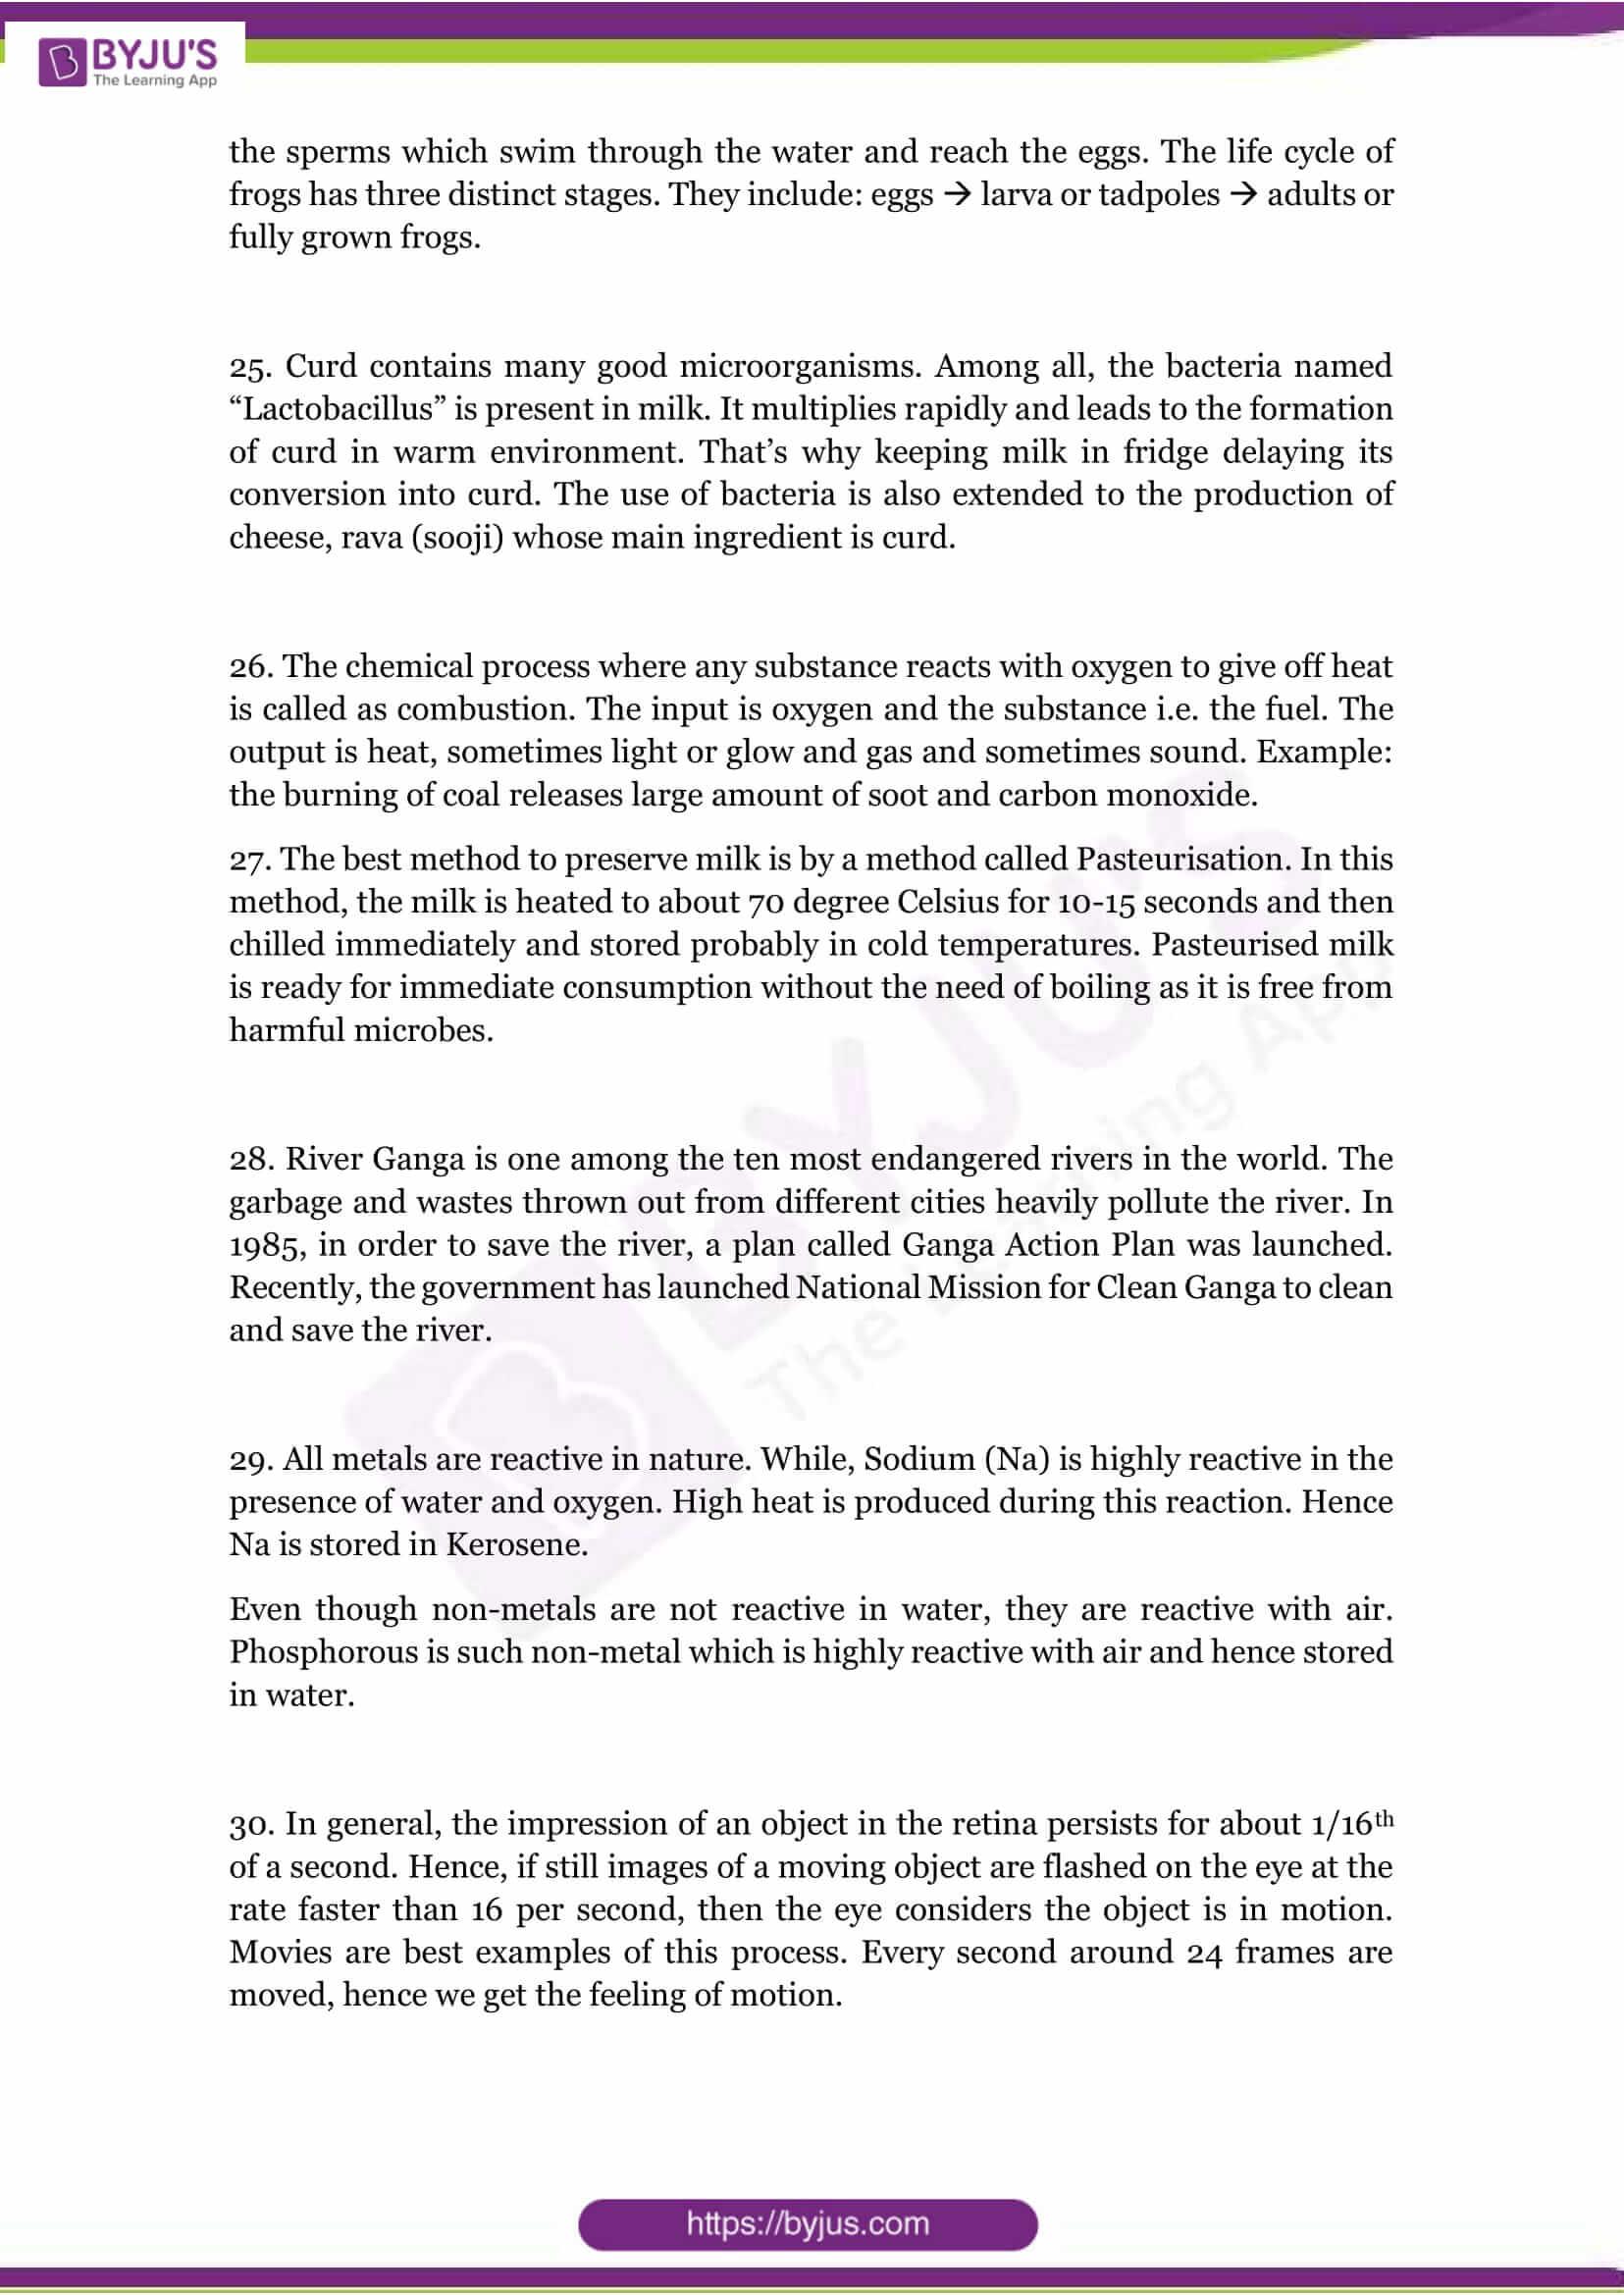 cbse class 8 science sample paper set 1 solution